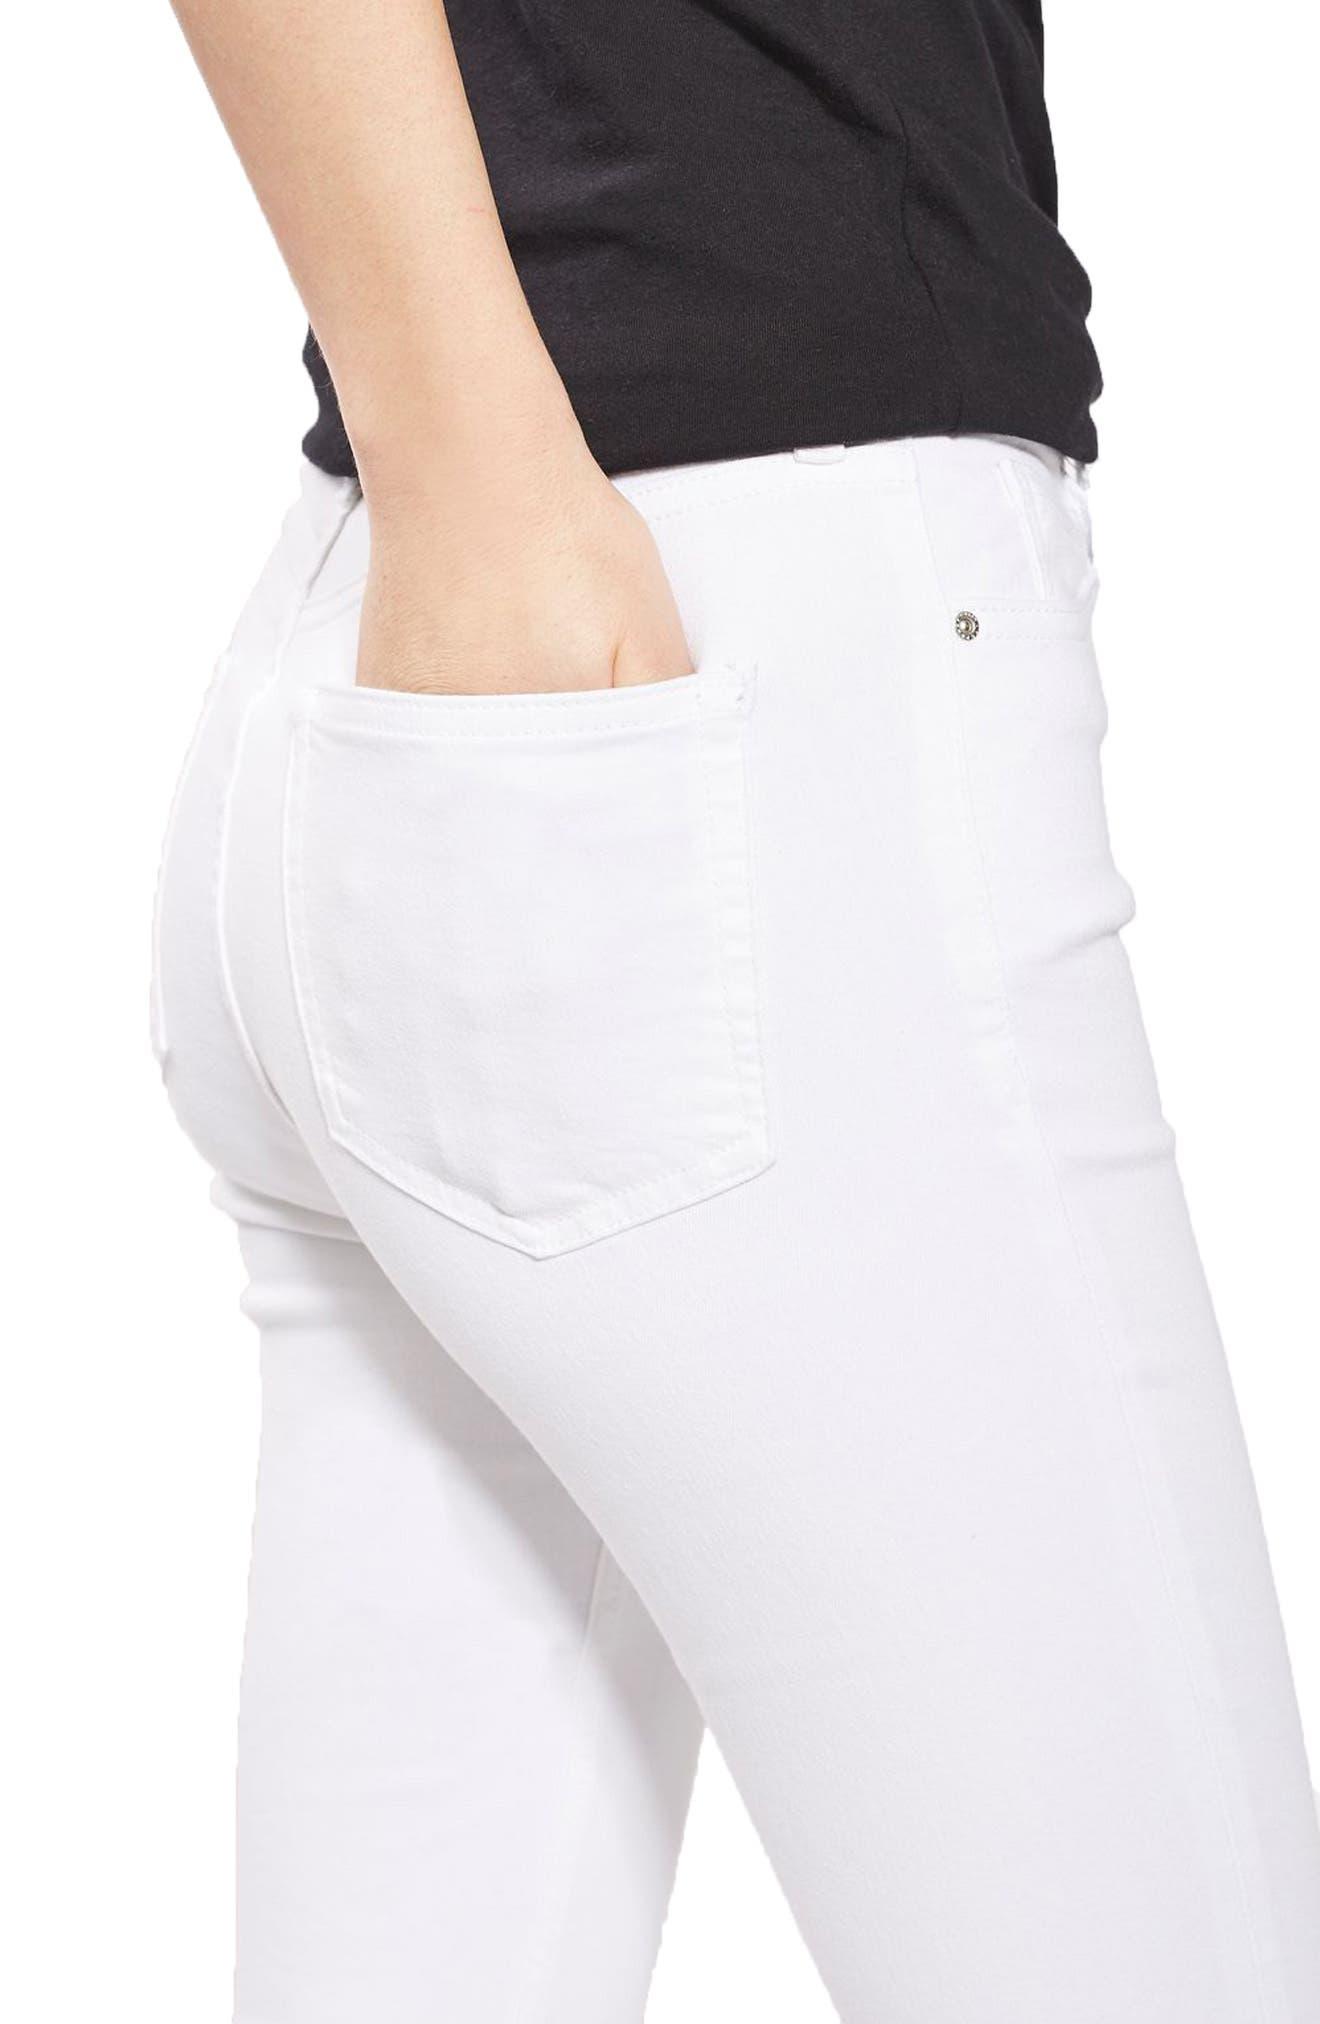 Jamie Raw Hem Skinny Jeans,                             Alternate thumbnail 5, color,                             White